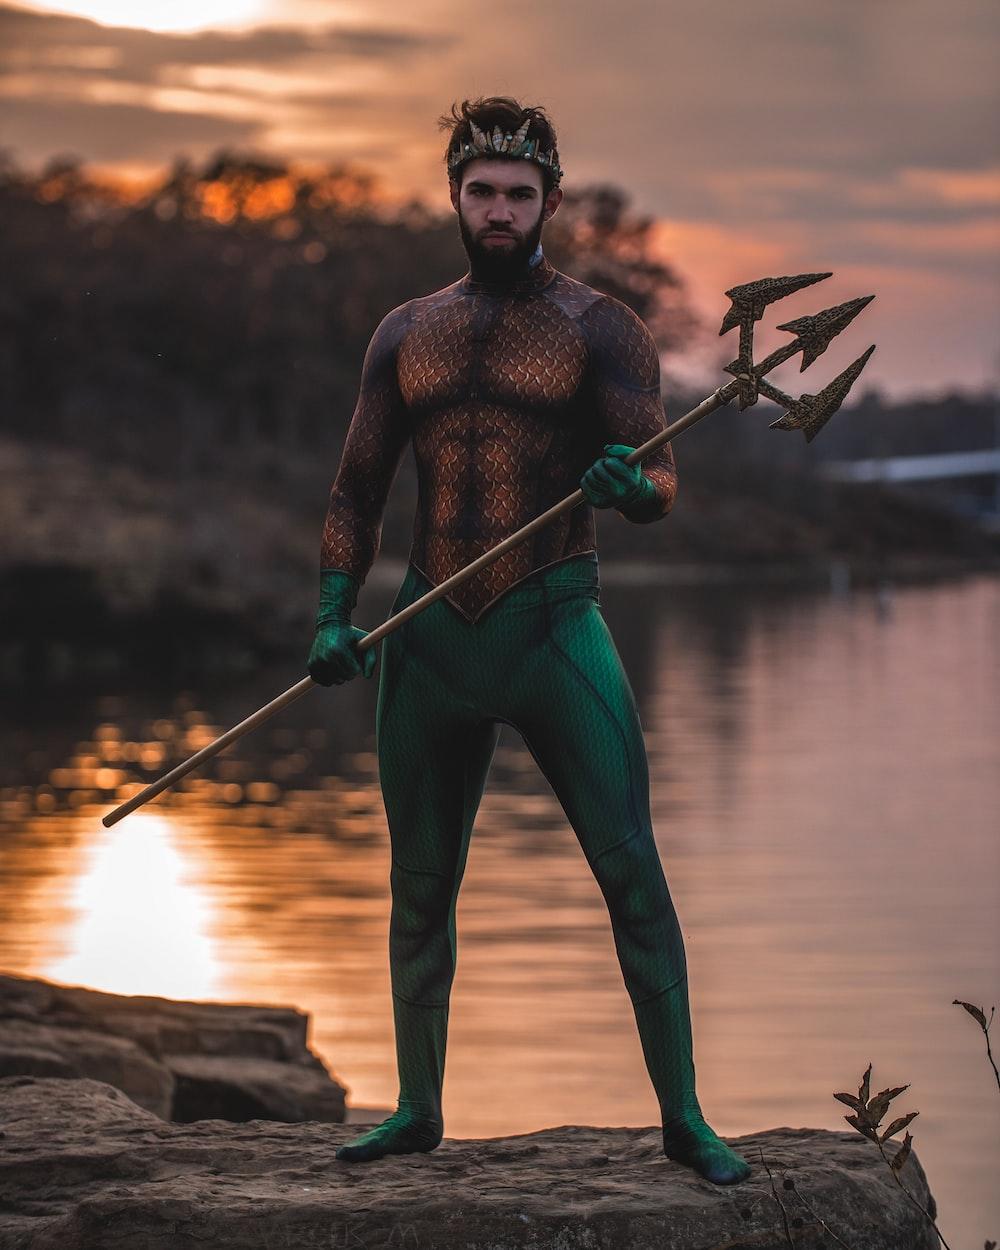 man wearing Poseidon costume standing on rock